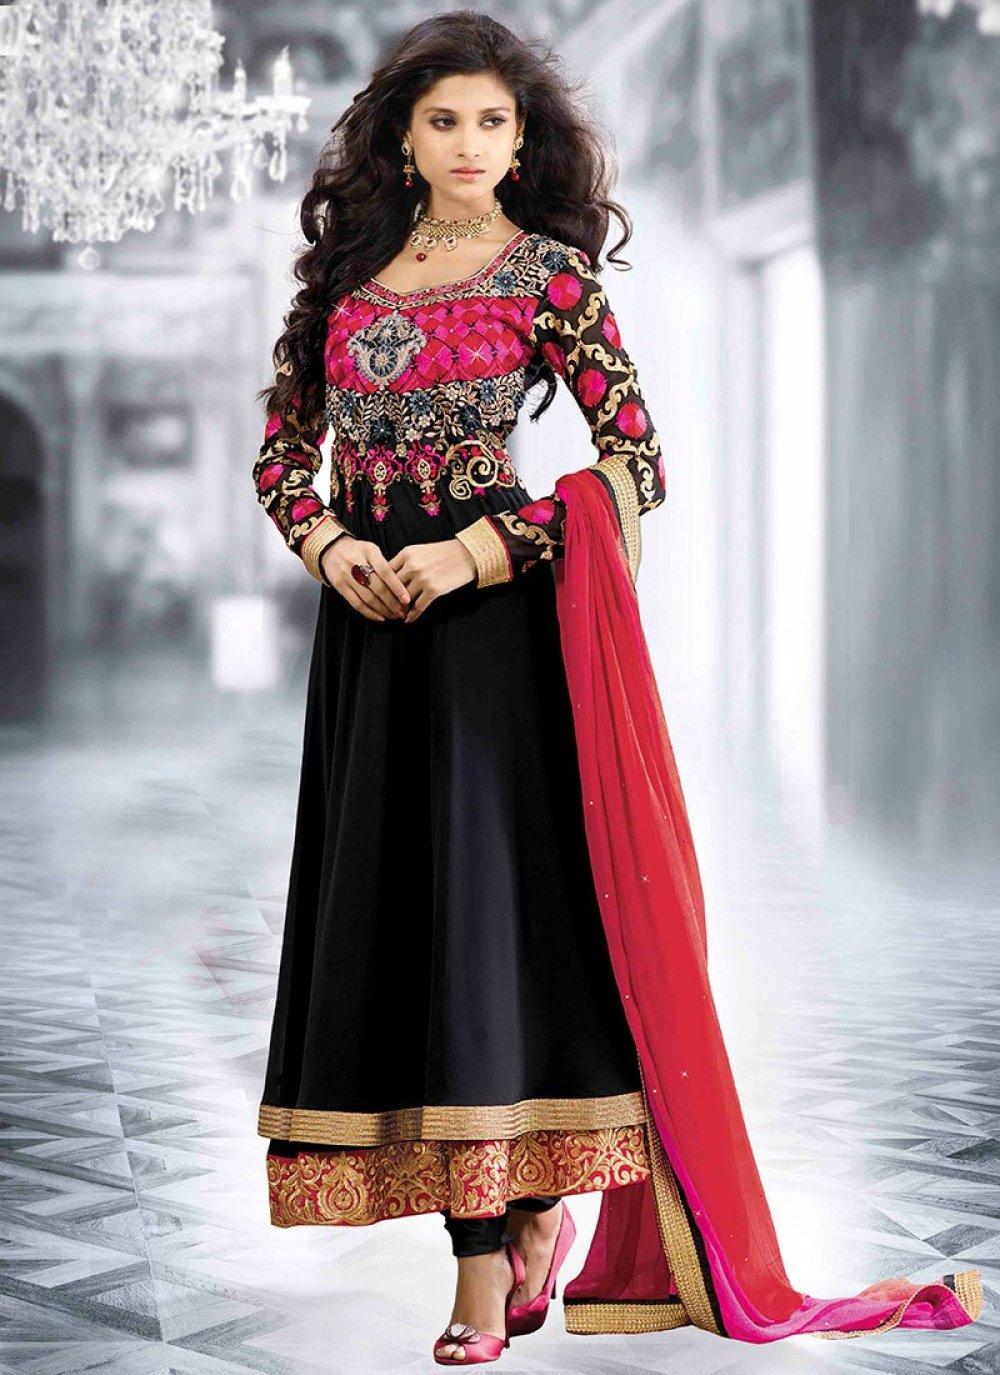 Black Resham Work Faux Georgette Anarkali Salwar Kameez